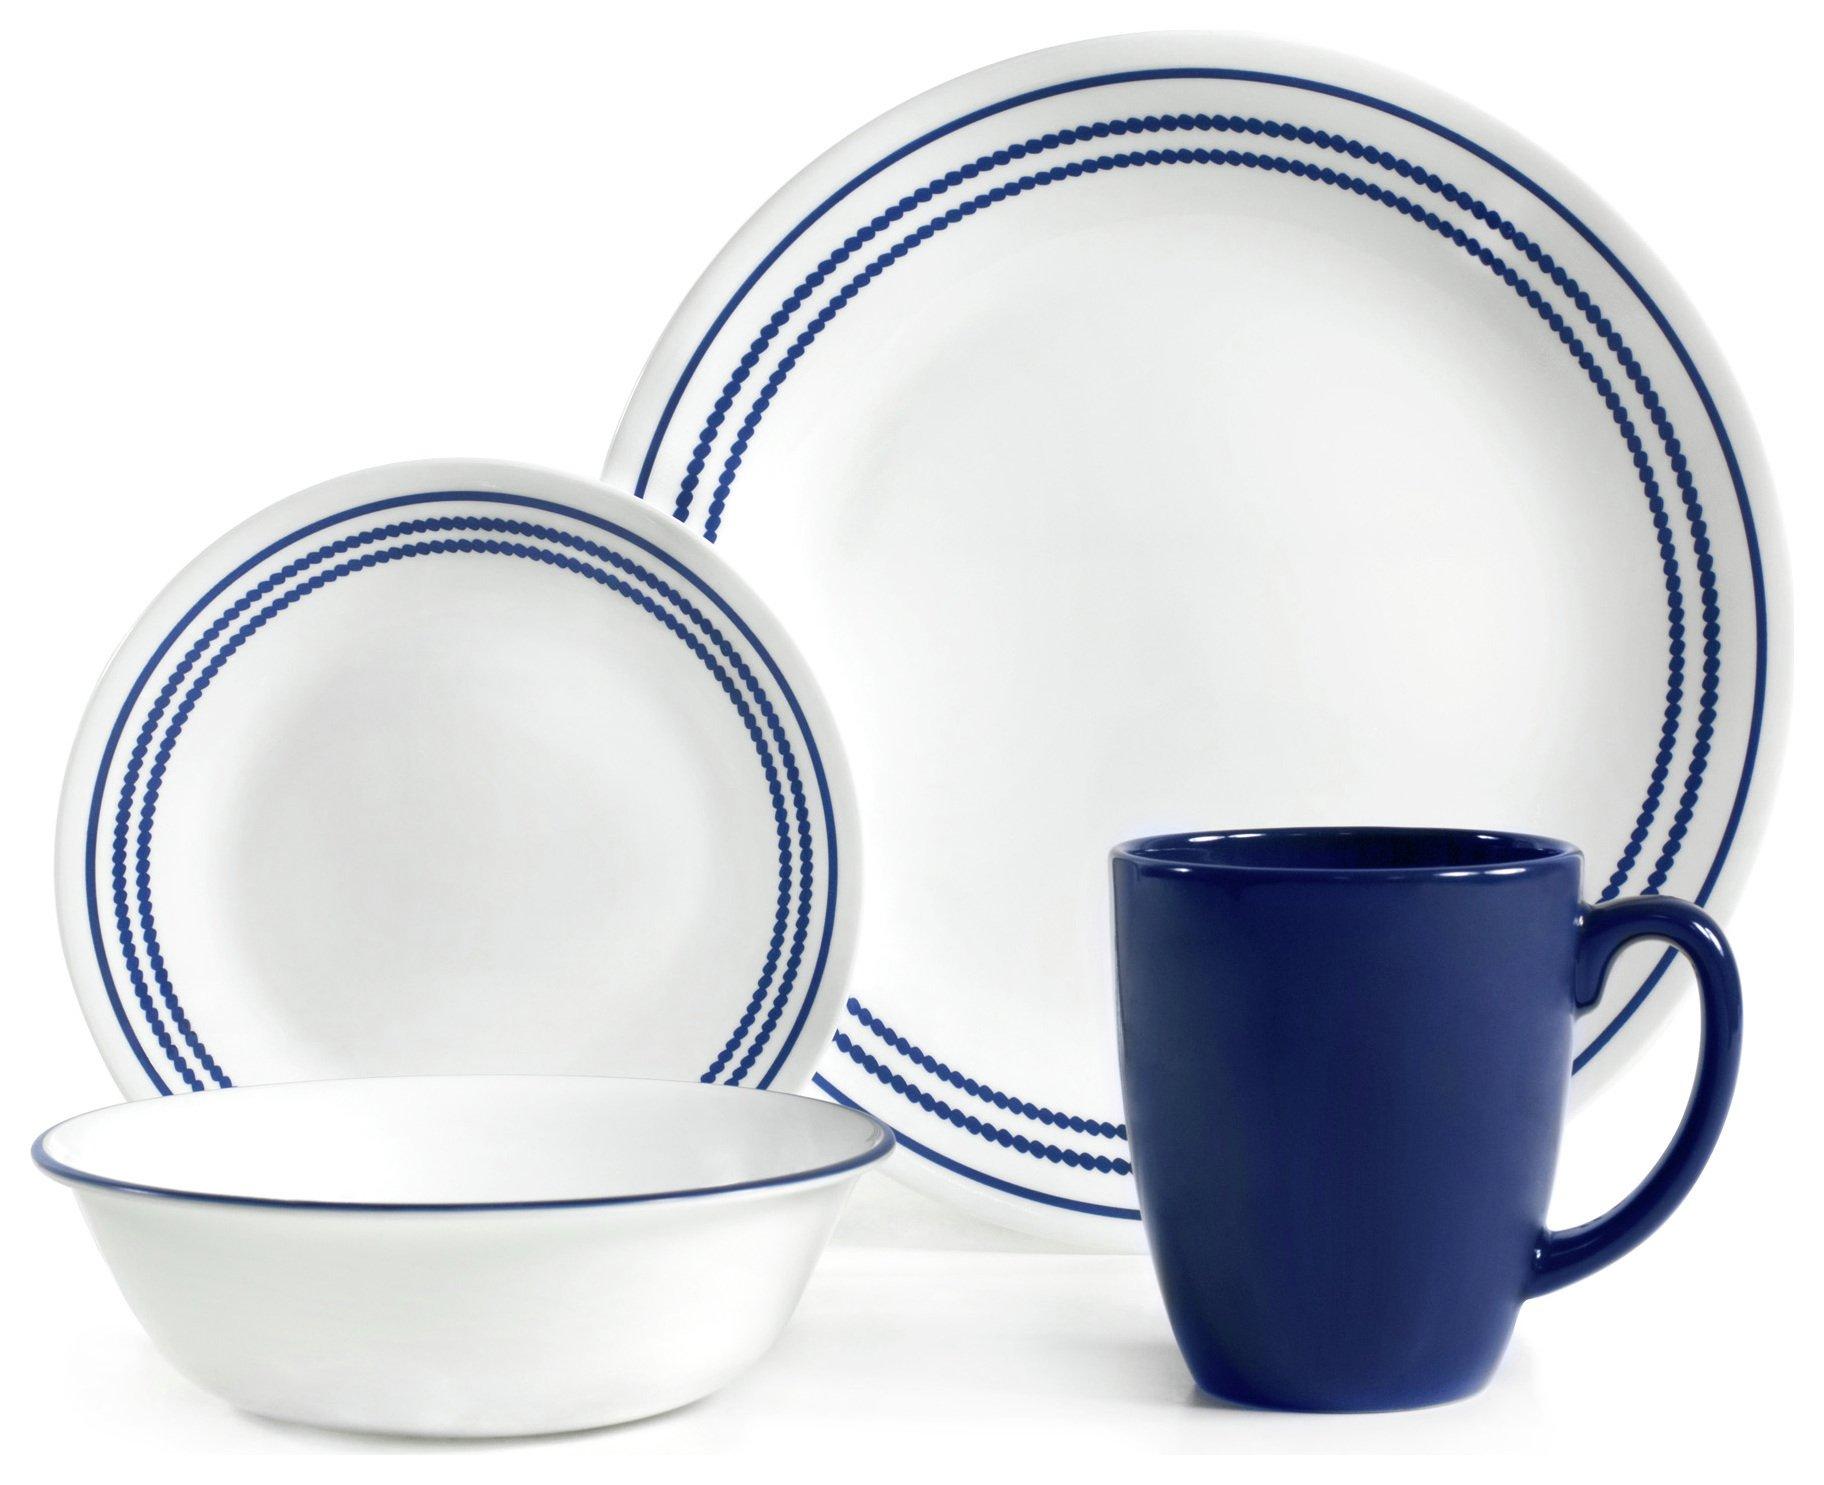 Crockery Sets: Dinner Sets, Dinnerware Sets - crockery ...